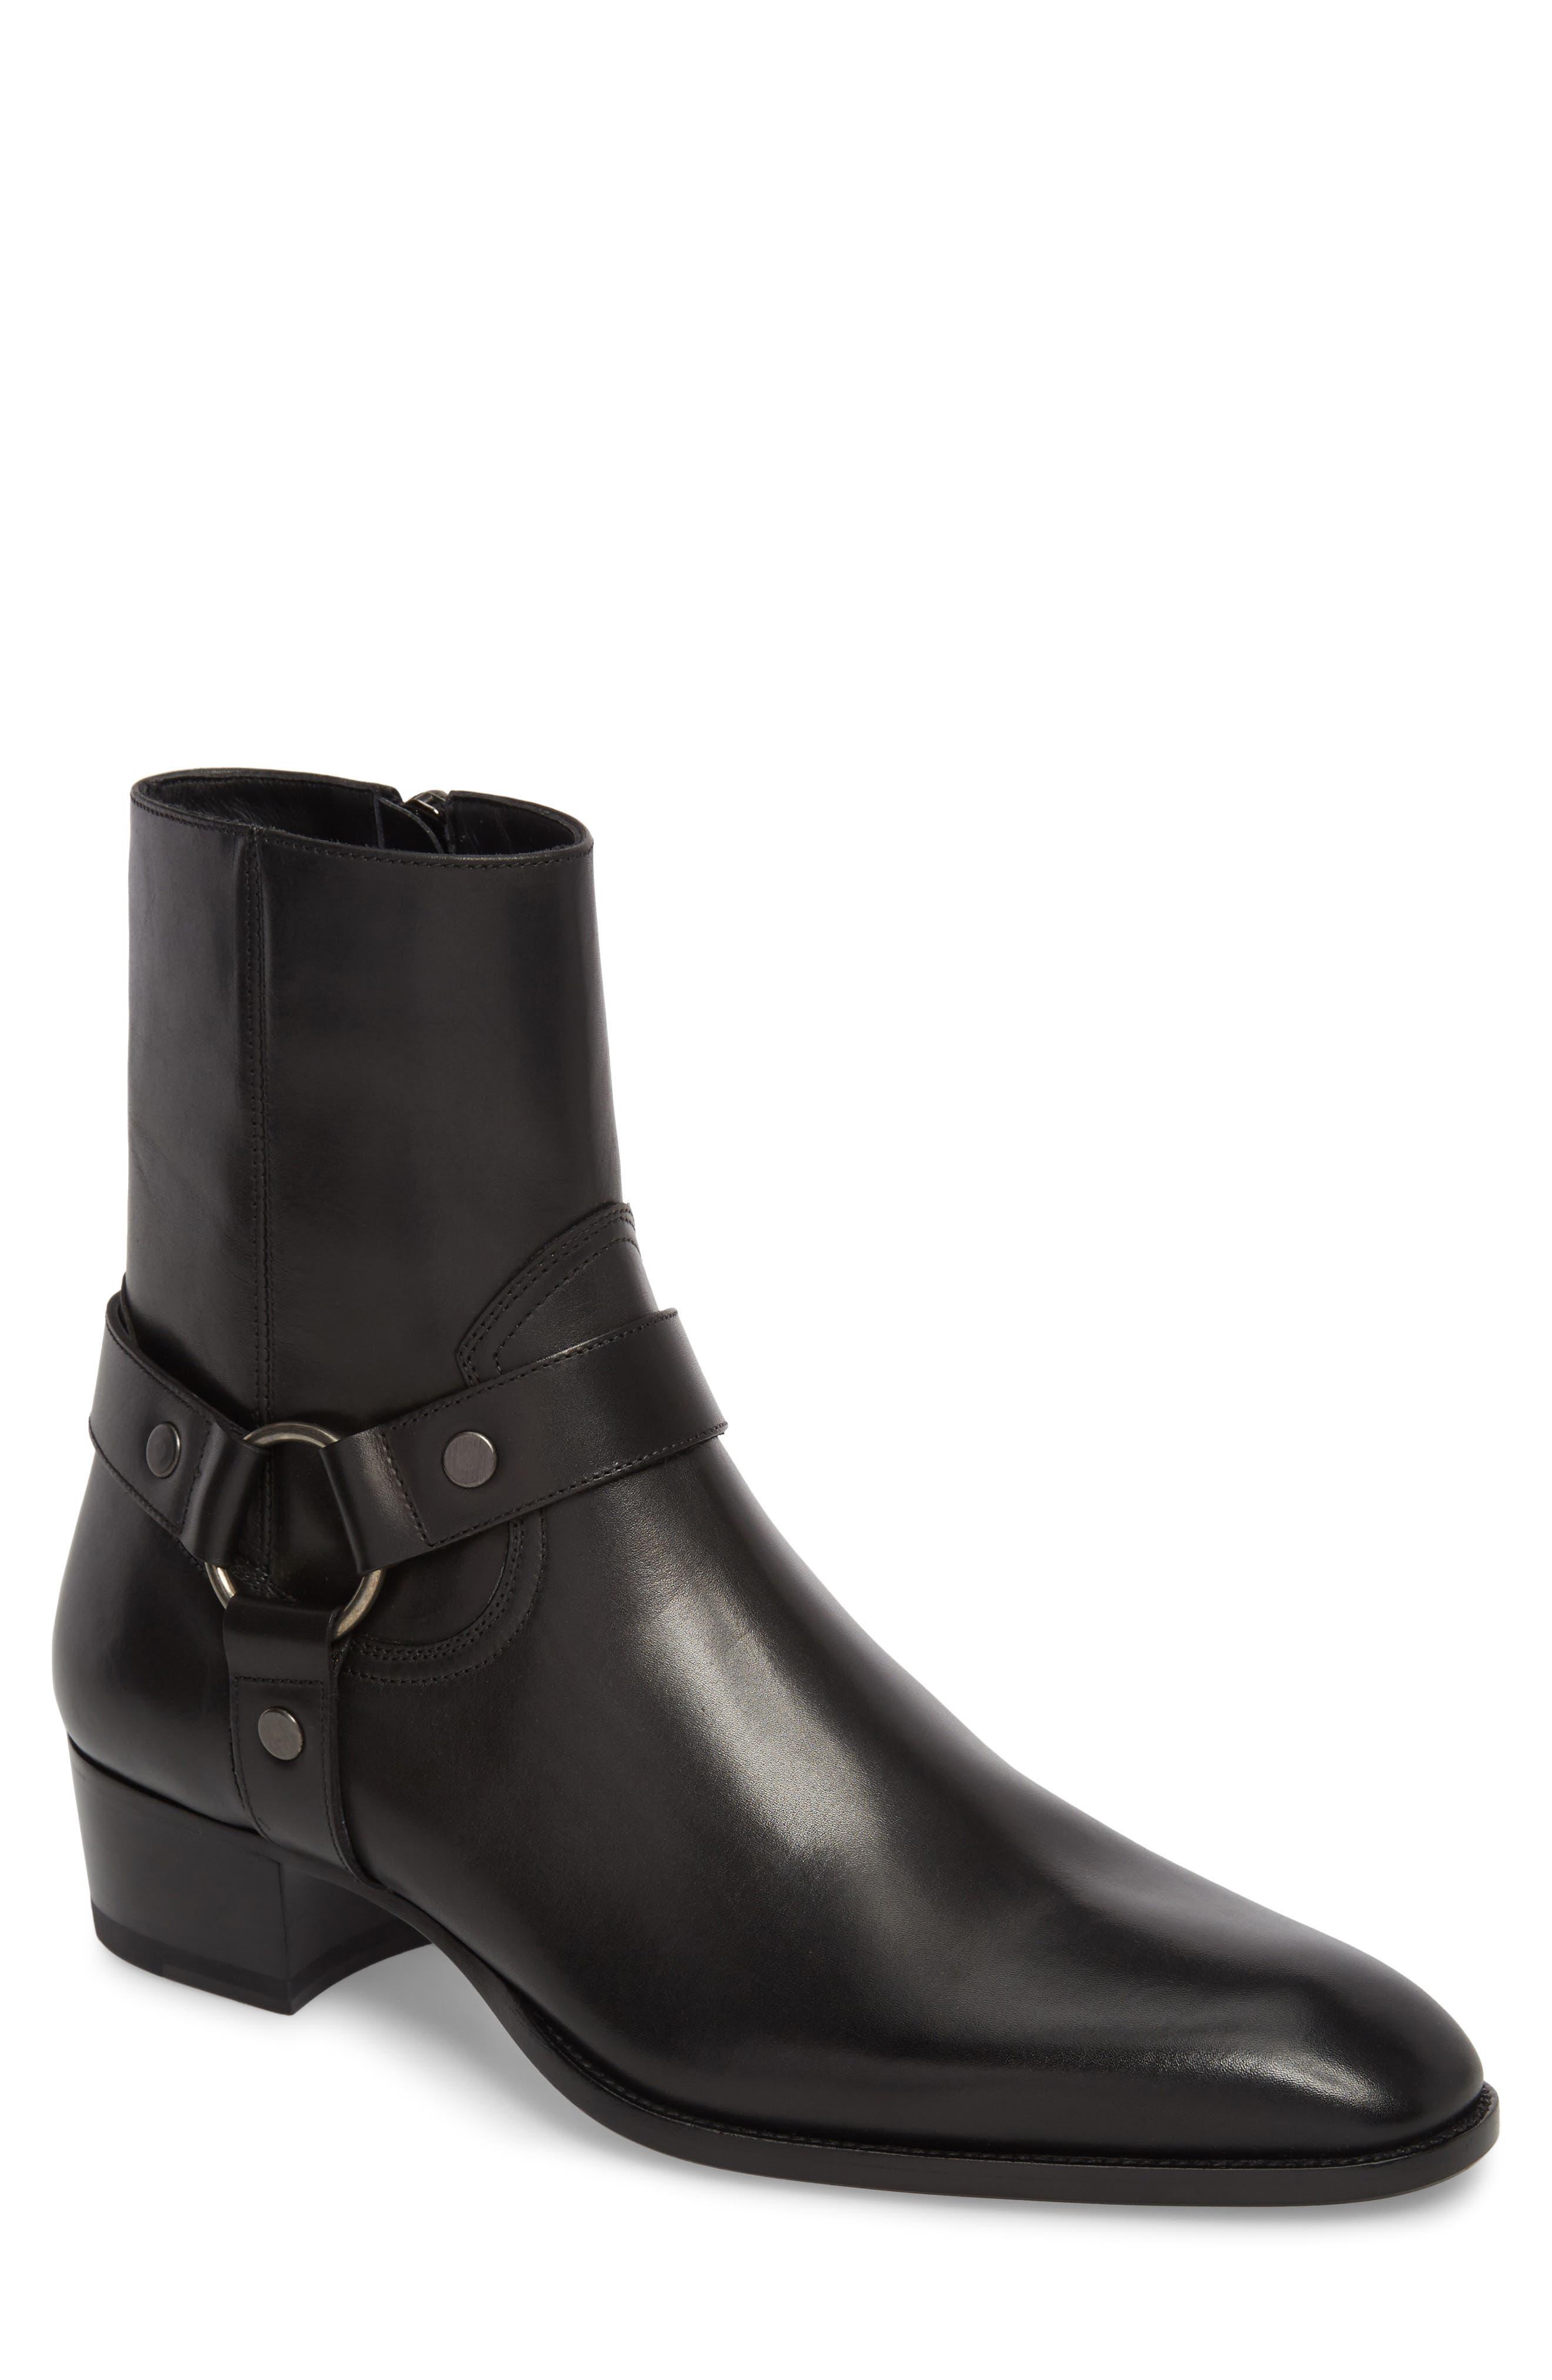 Men'S Wyatt Leather Harness Boots in Coal